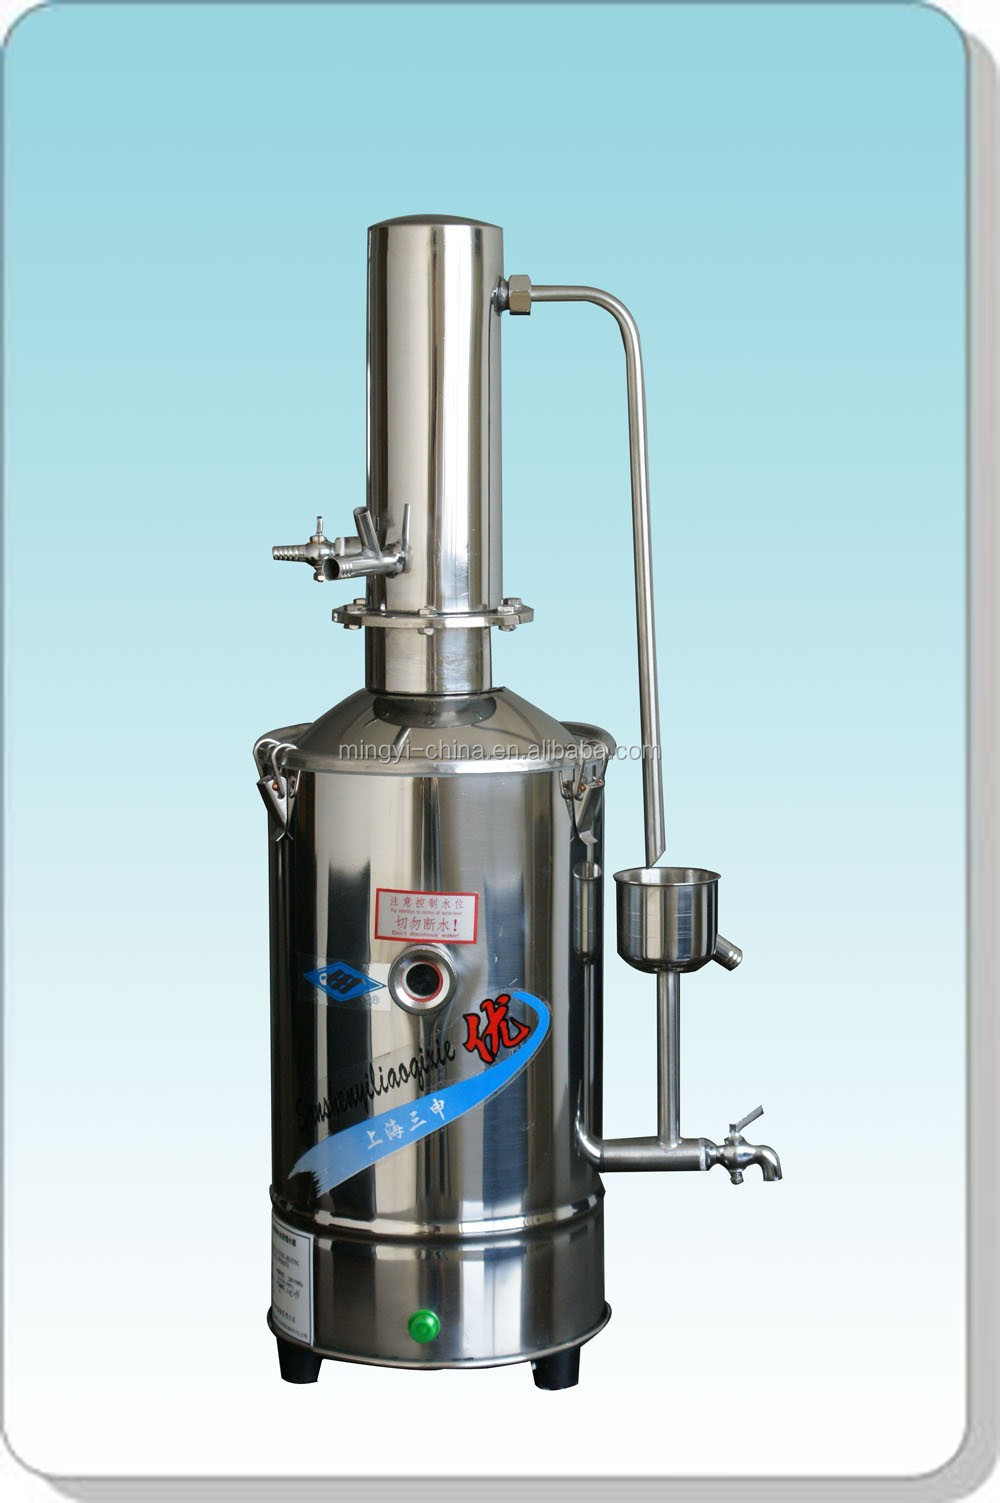 Water Distillation Equipment ~ Laboratory water distillation apparatus for sale buy